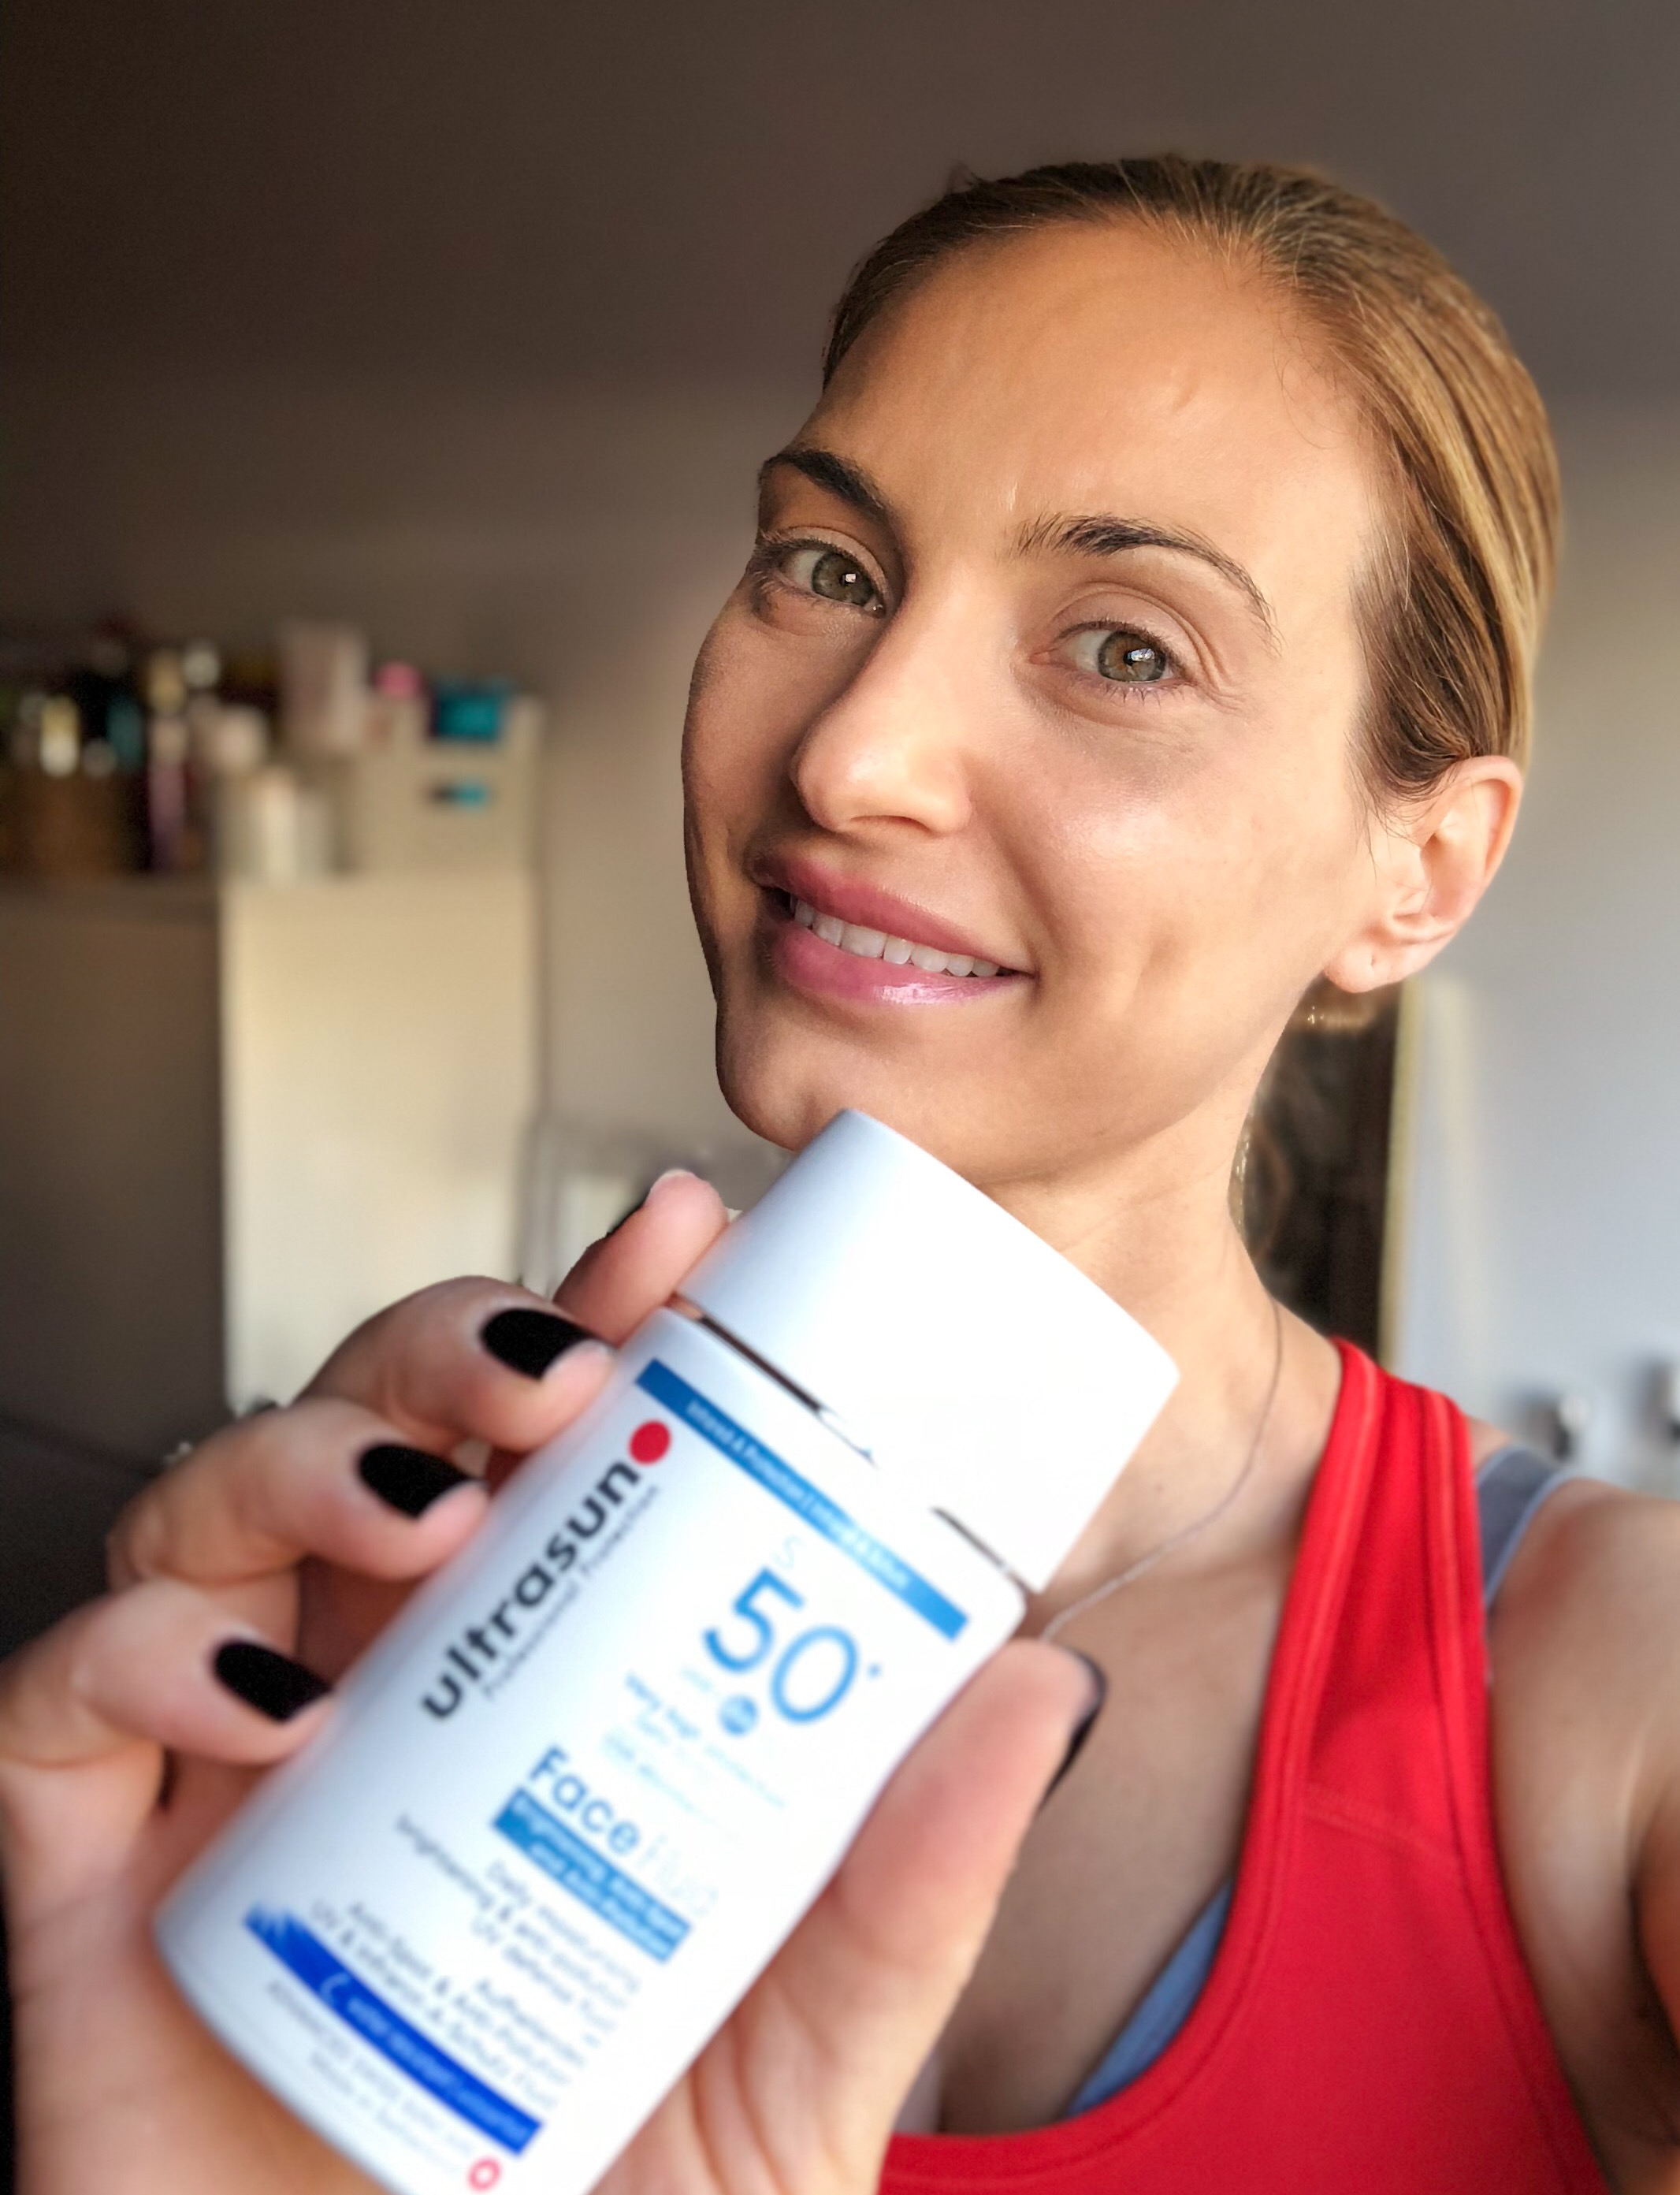 Ultrasun Daily Face Fluid Antipollution SPF 50+ - Secrets In Beauty